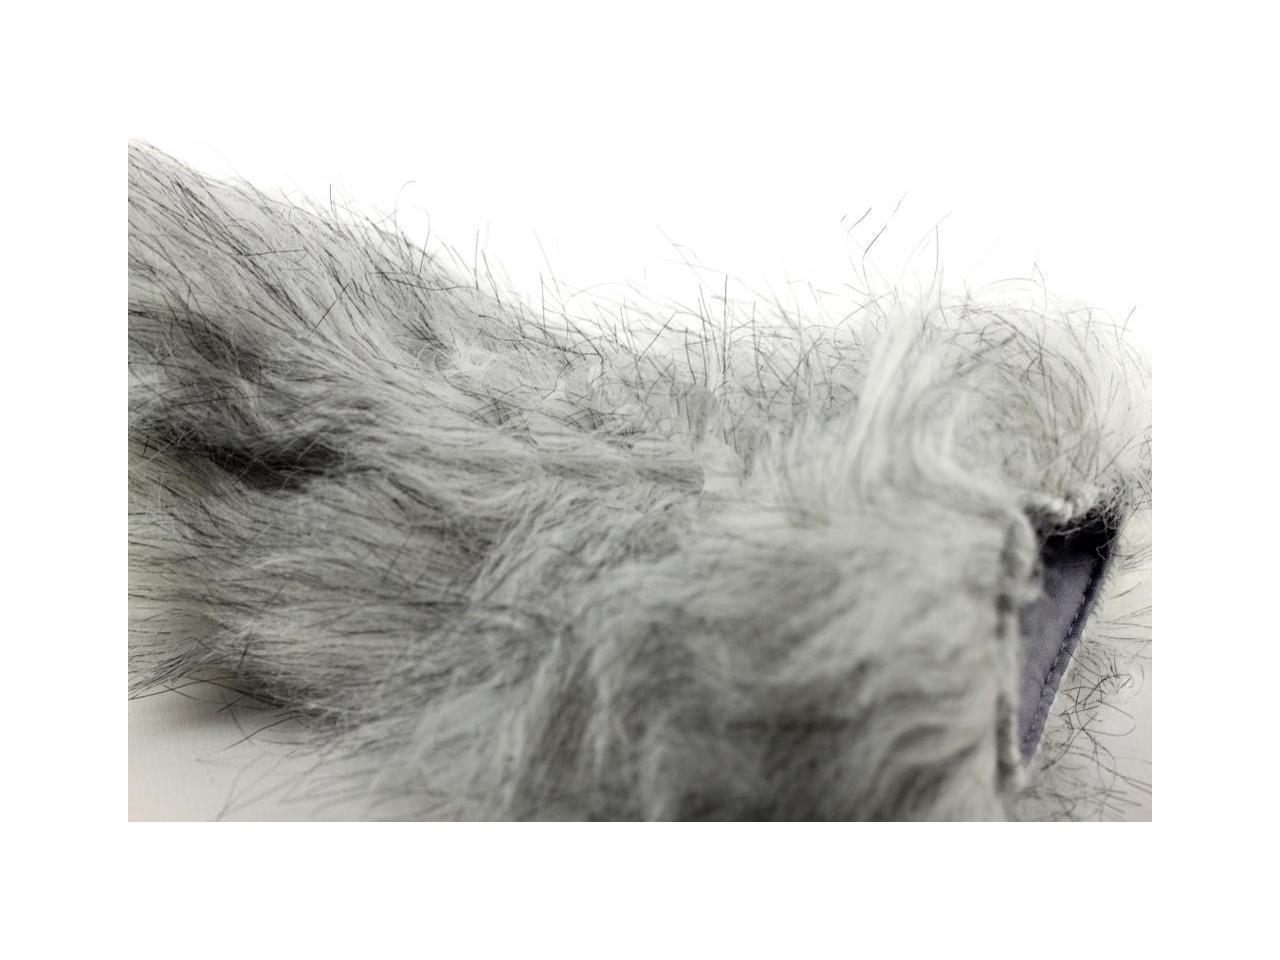 w//Multi-Interface Adapter Shotgun Microphone Stereo With Windscreen /& Dead Cat Muff For Sony Cyber-shot DSC-RX100 II